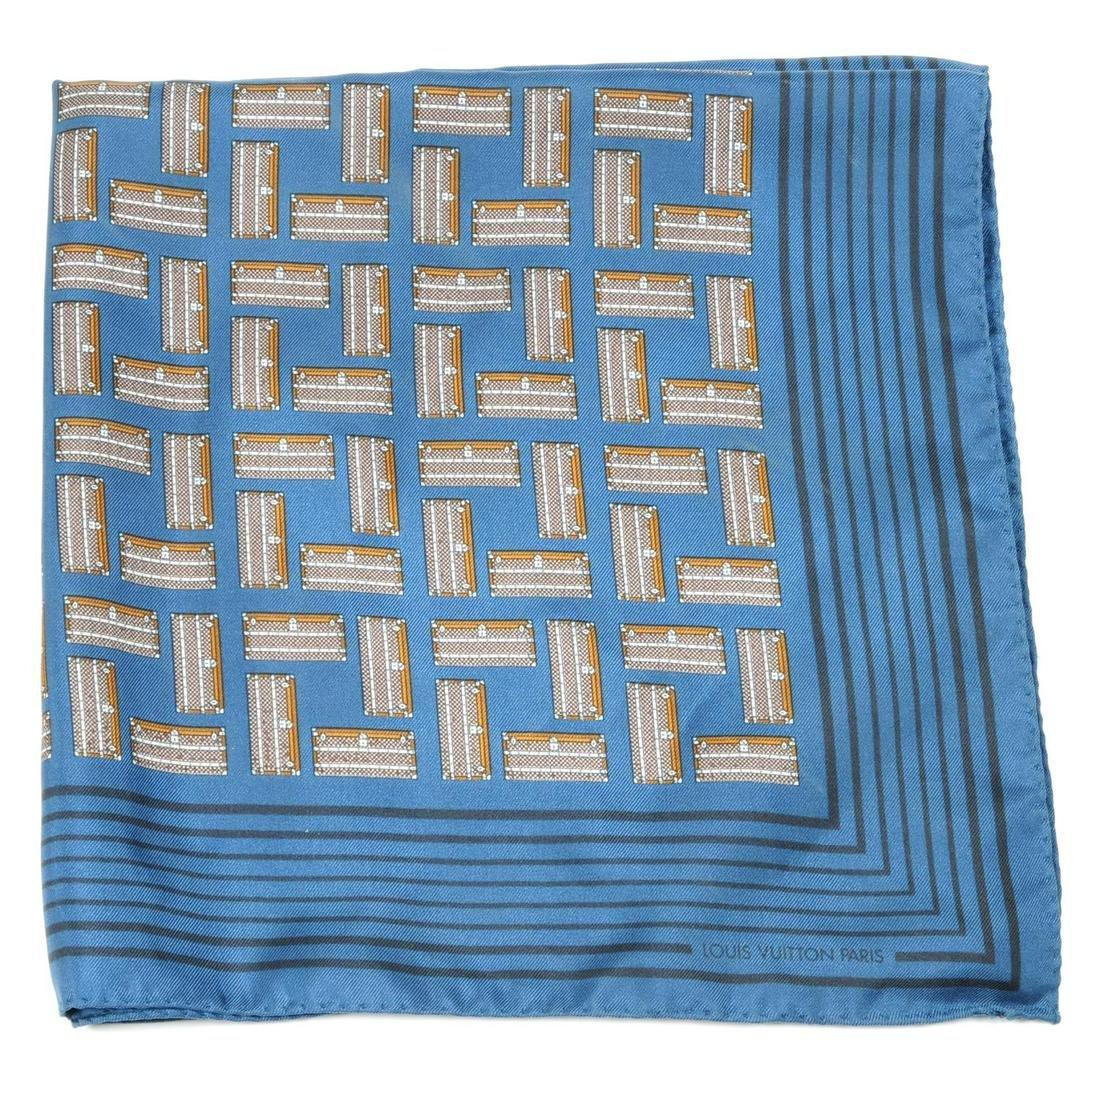 LOUIS VUITTON - a square silk teal scarf. Featuring a